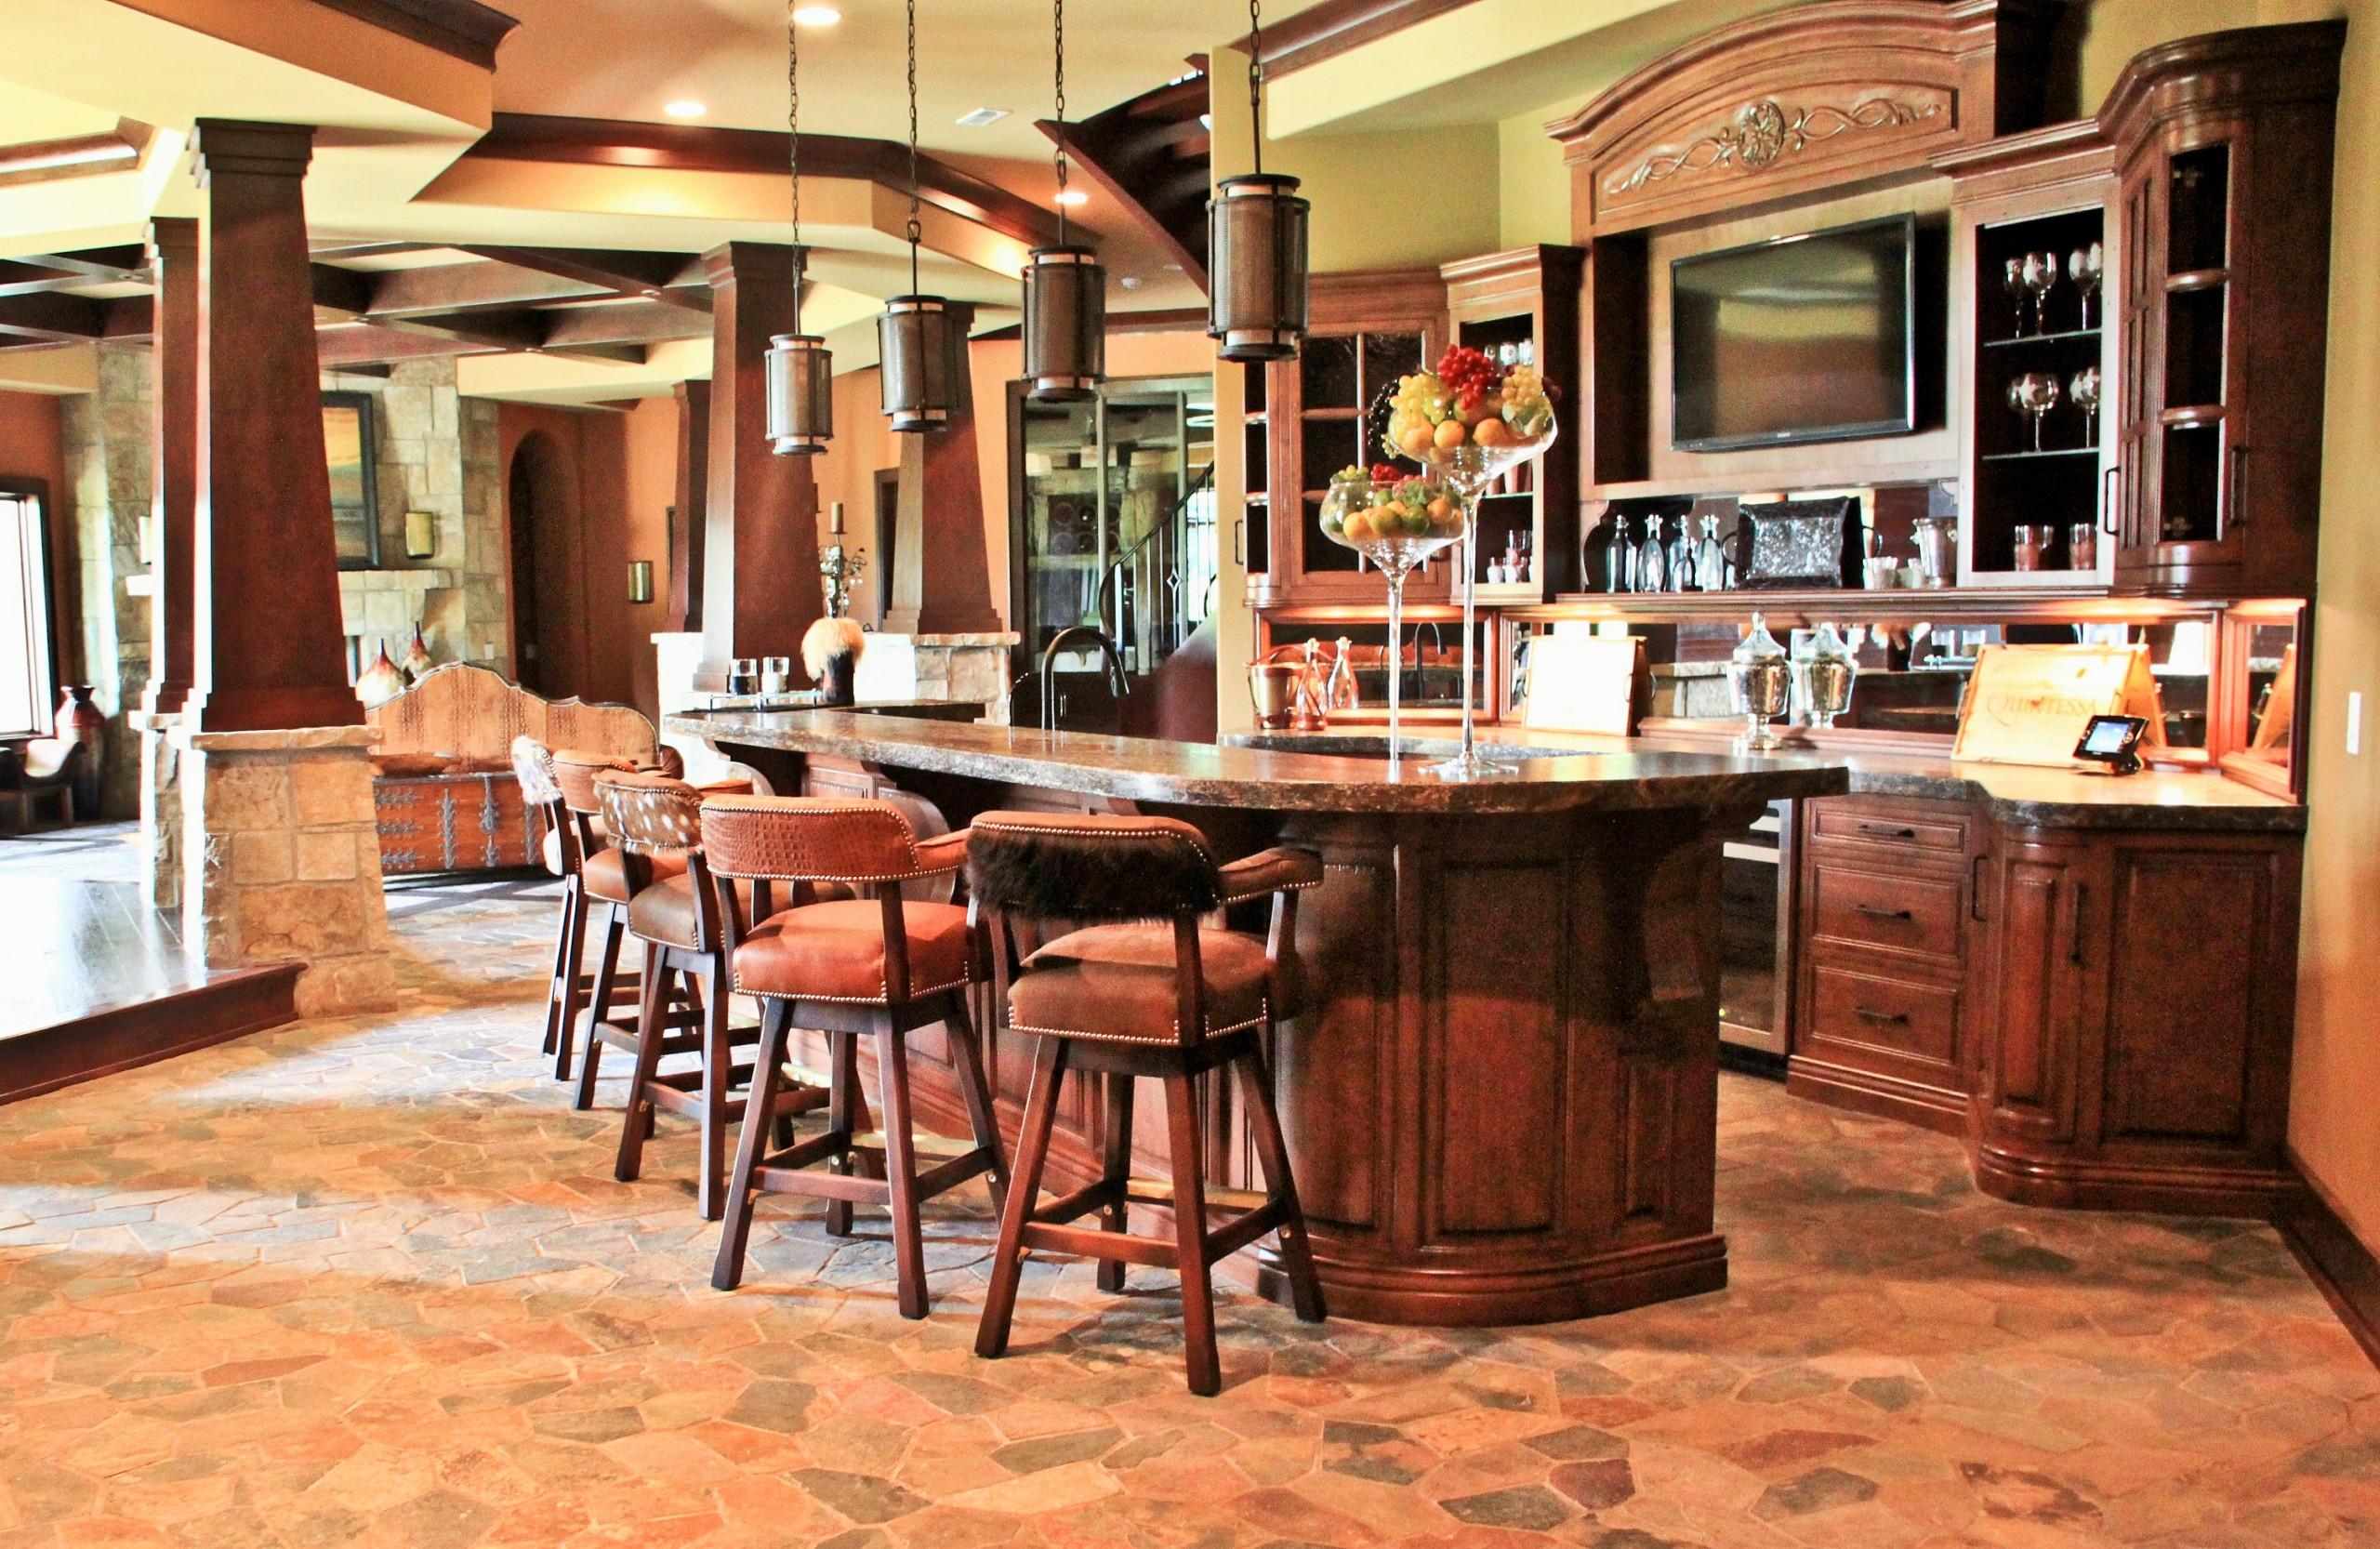 2012 Indianapolis Dream Home basement bar